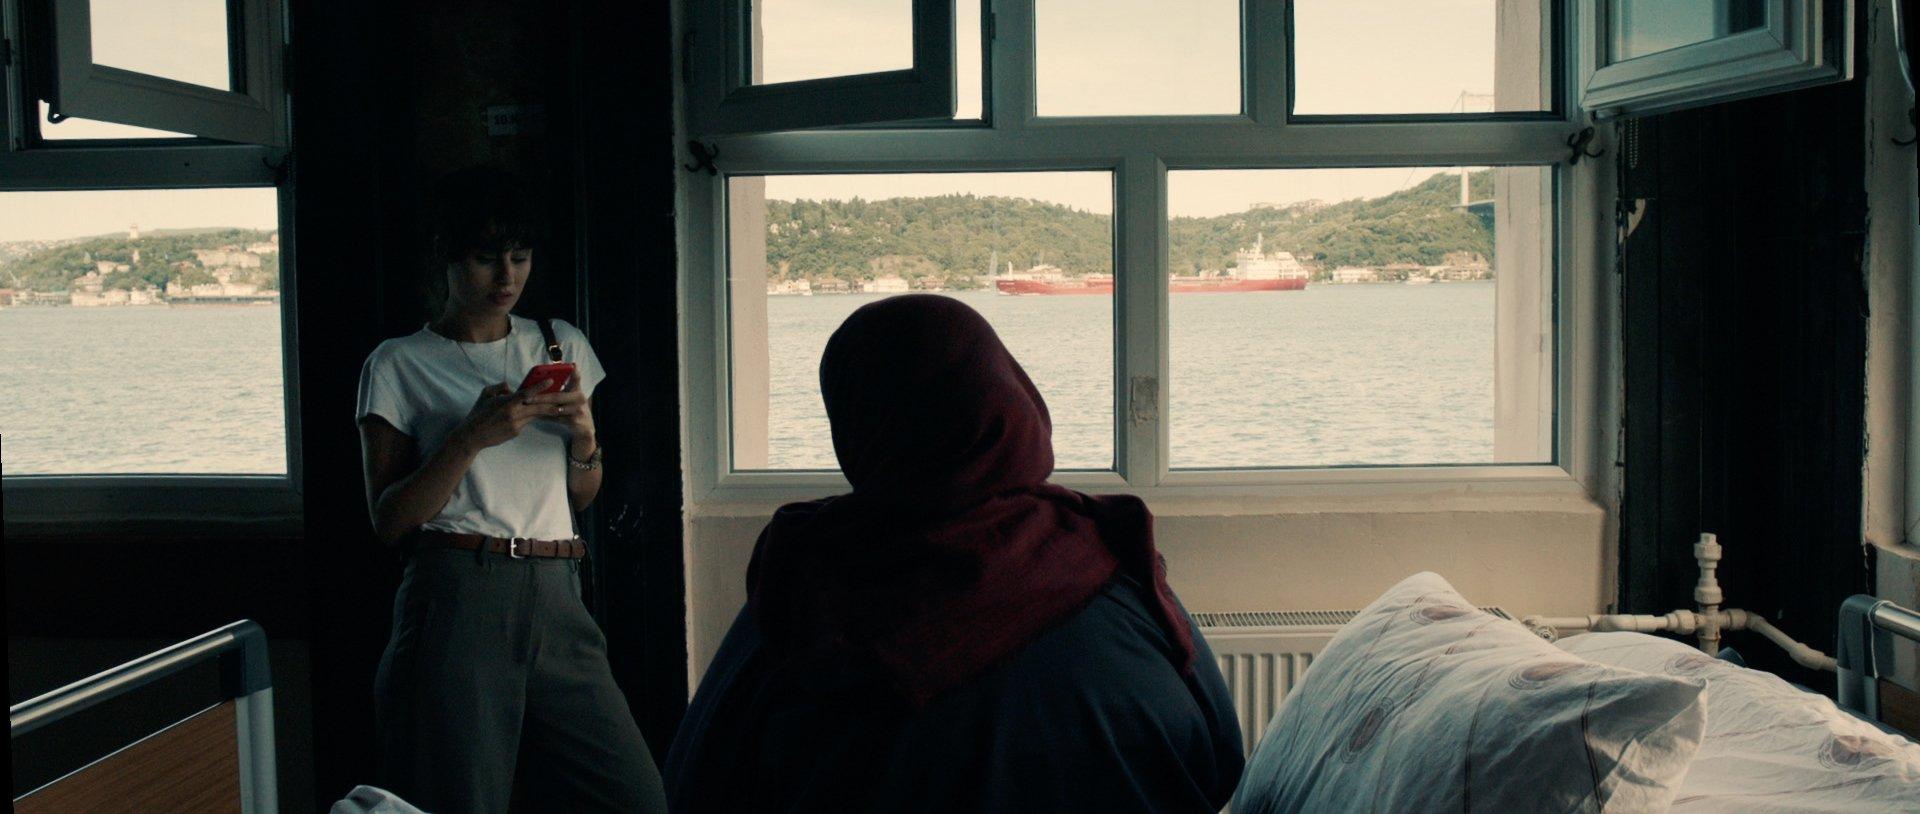 Selin Dumlugöl (L) and Şengül Deniz are seen in a scene from